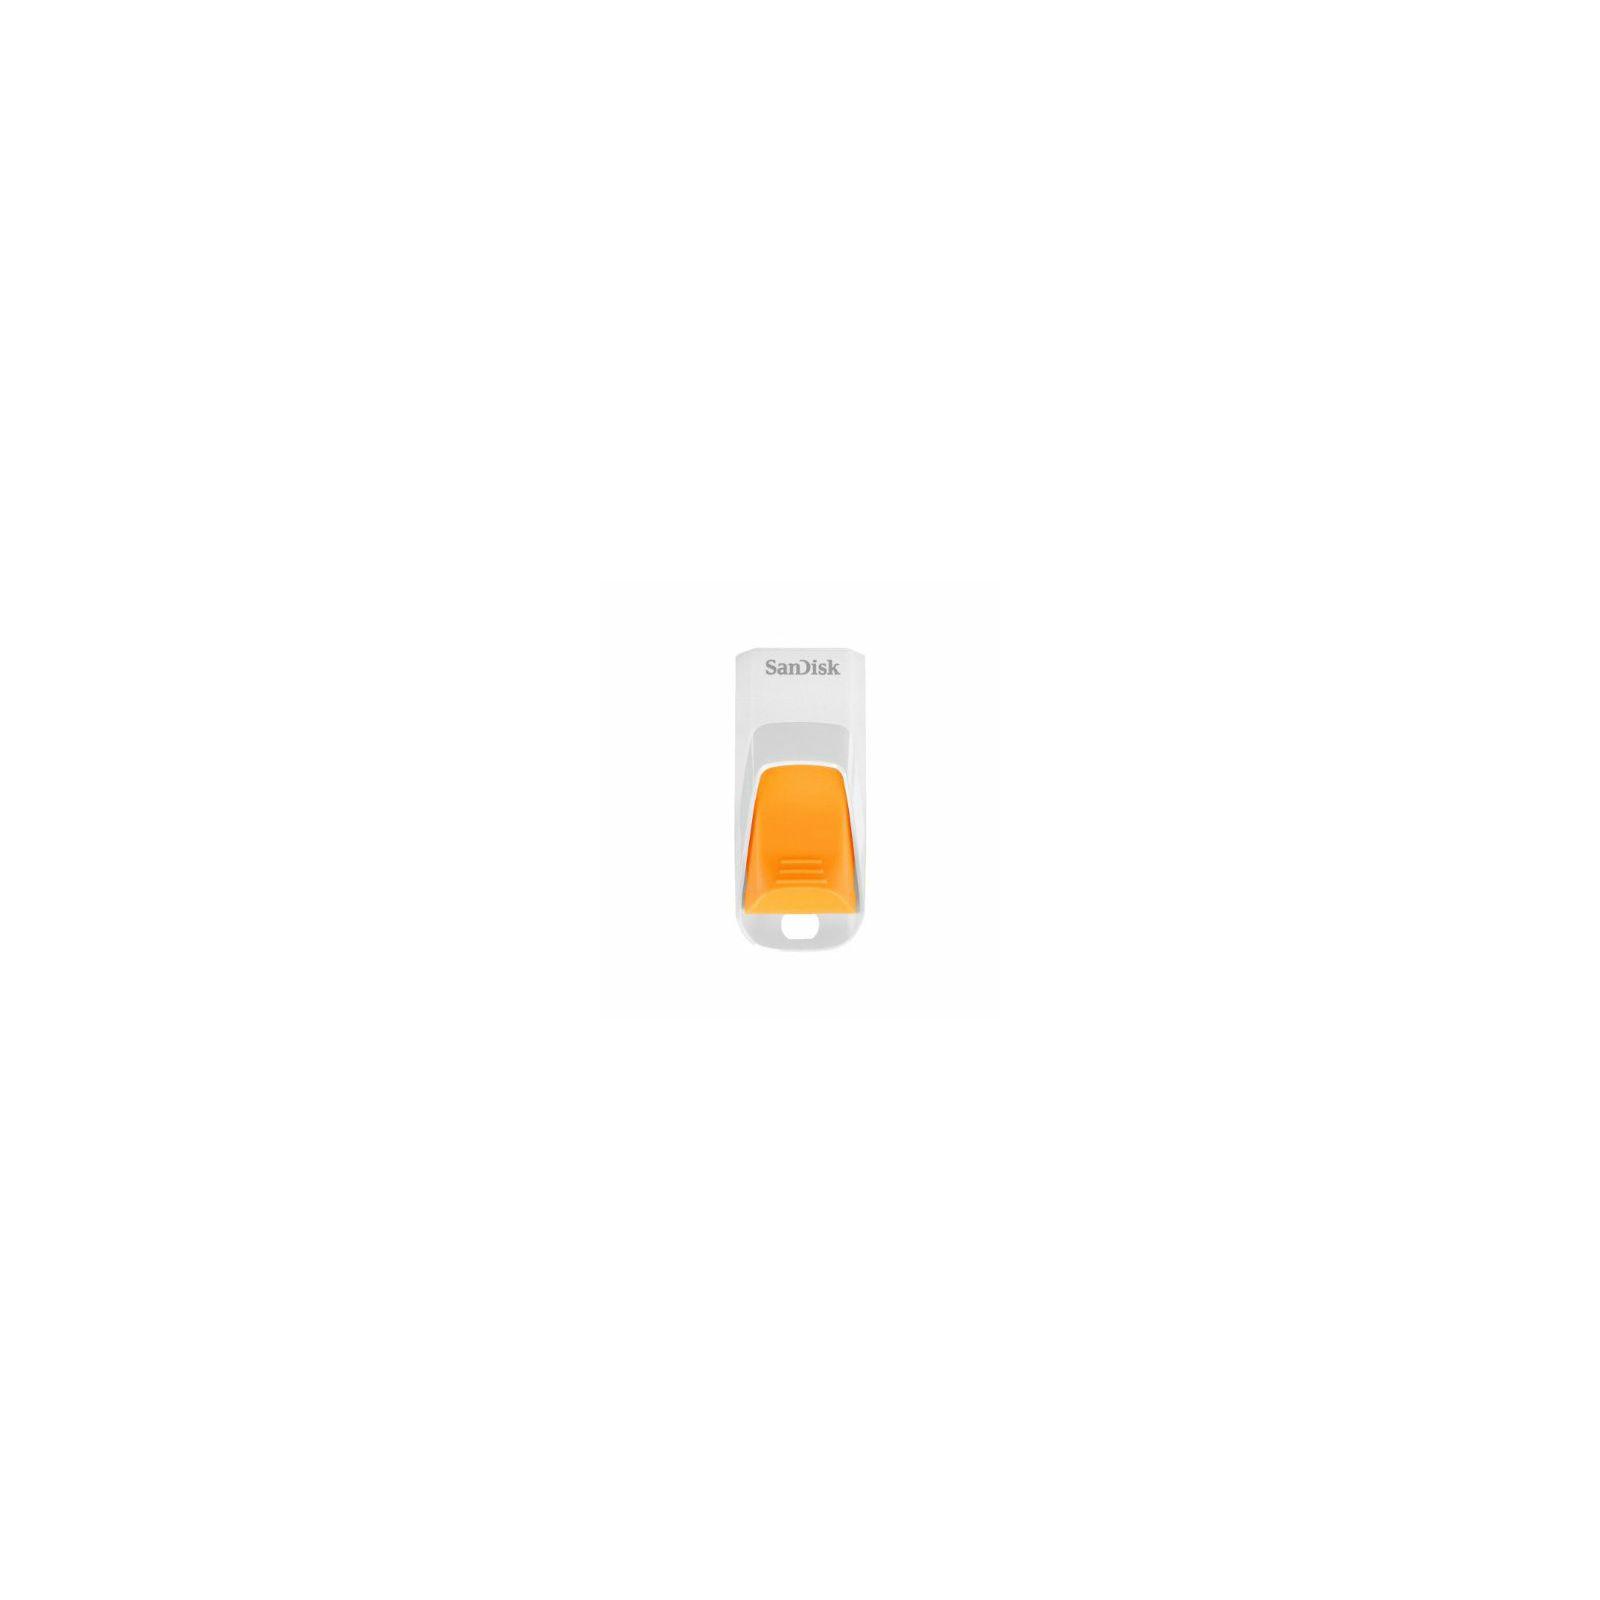 SanDisk Cruzer Edge 8GB White/Orange SDCZ51W-008G-B35O USB Memory stick